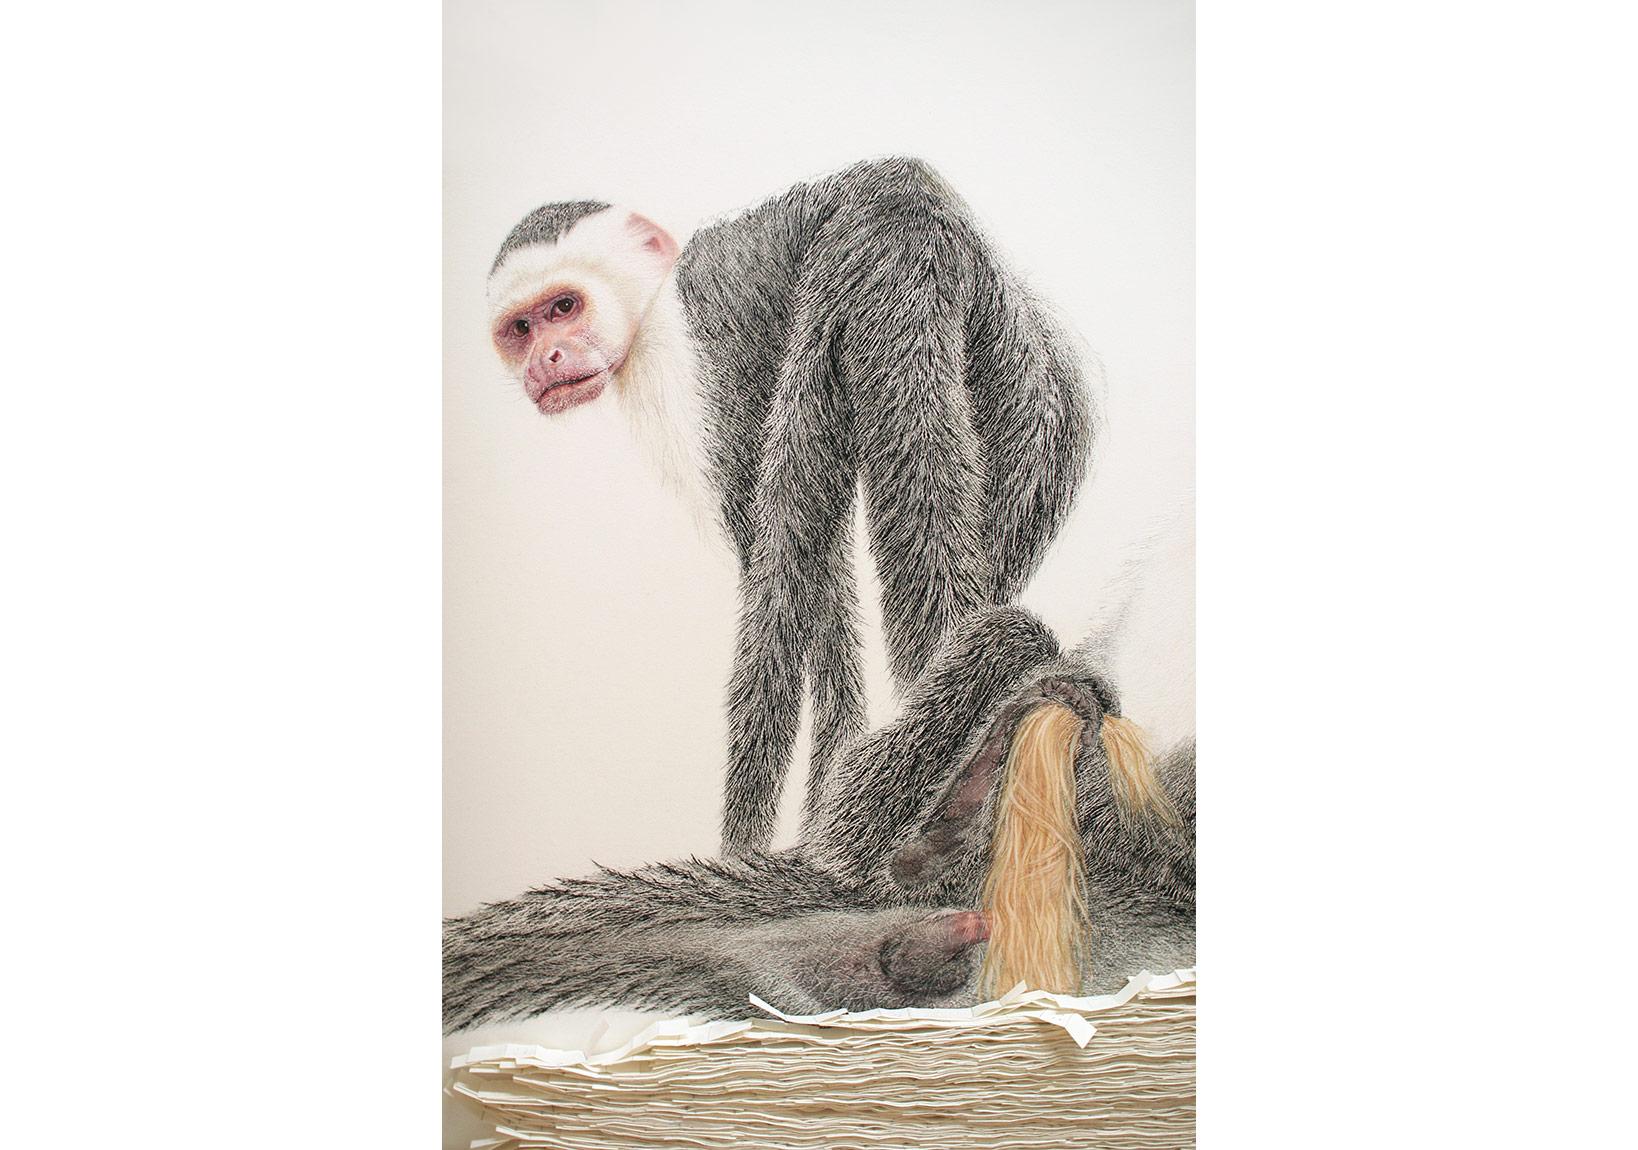 (Apo)tropaion #1 - Kağıt üzerine pastel, kağıt yara bantları, 215cm x 110cm x 4cm, detay ~60cm x 40cm x 4cm, 2012 - Copyright Svenja Schüffler